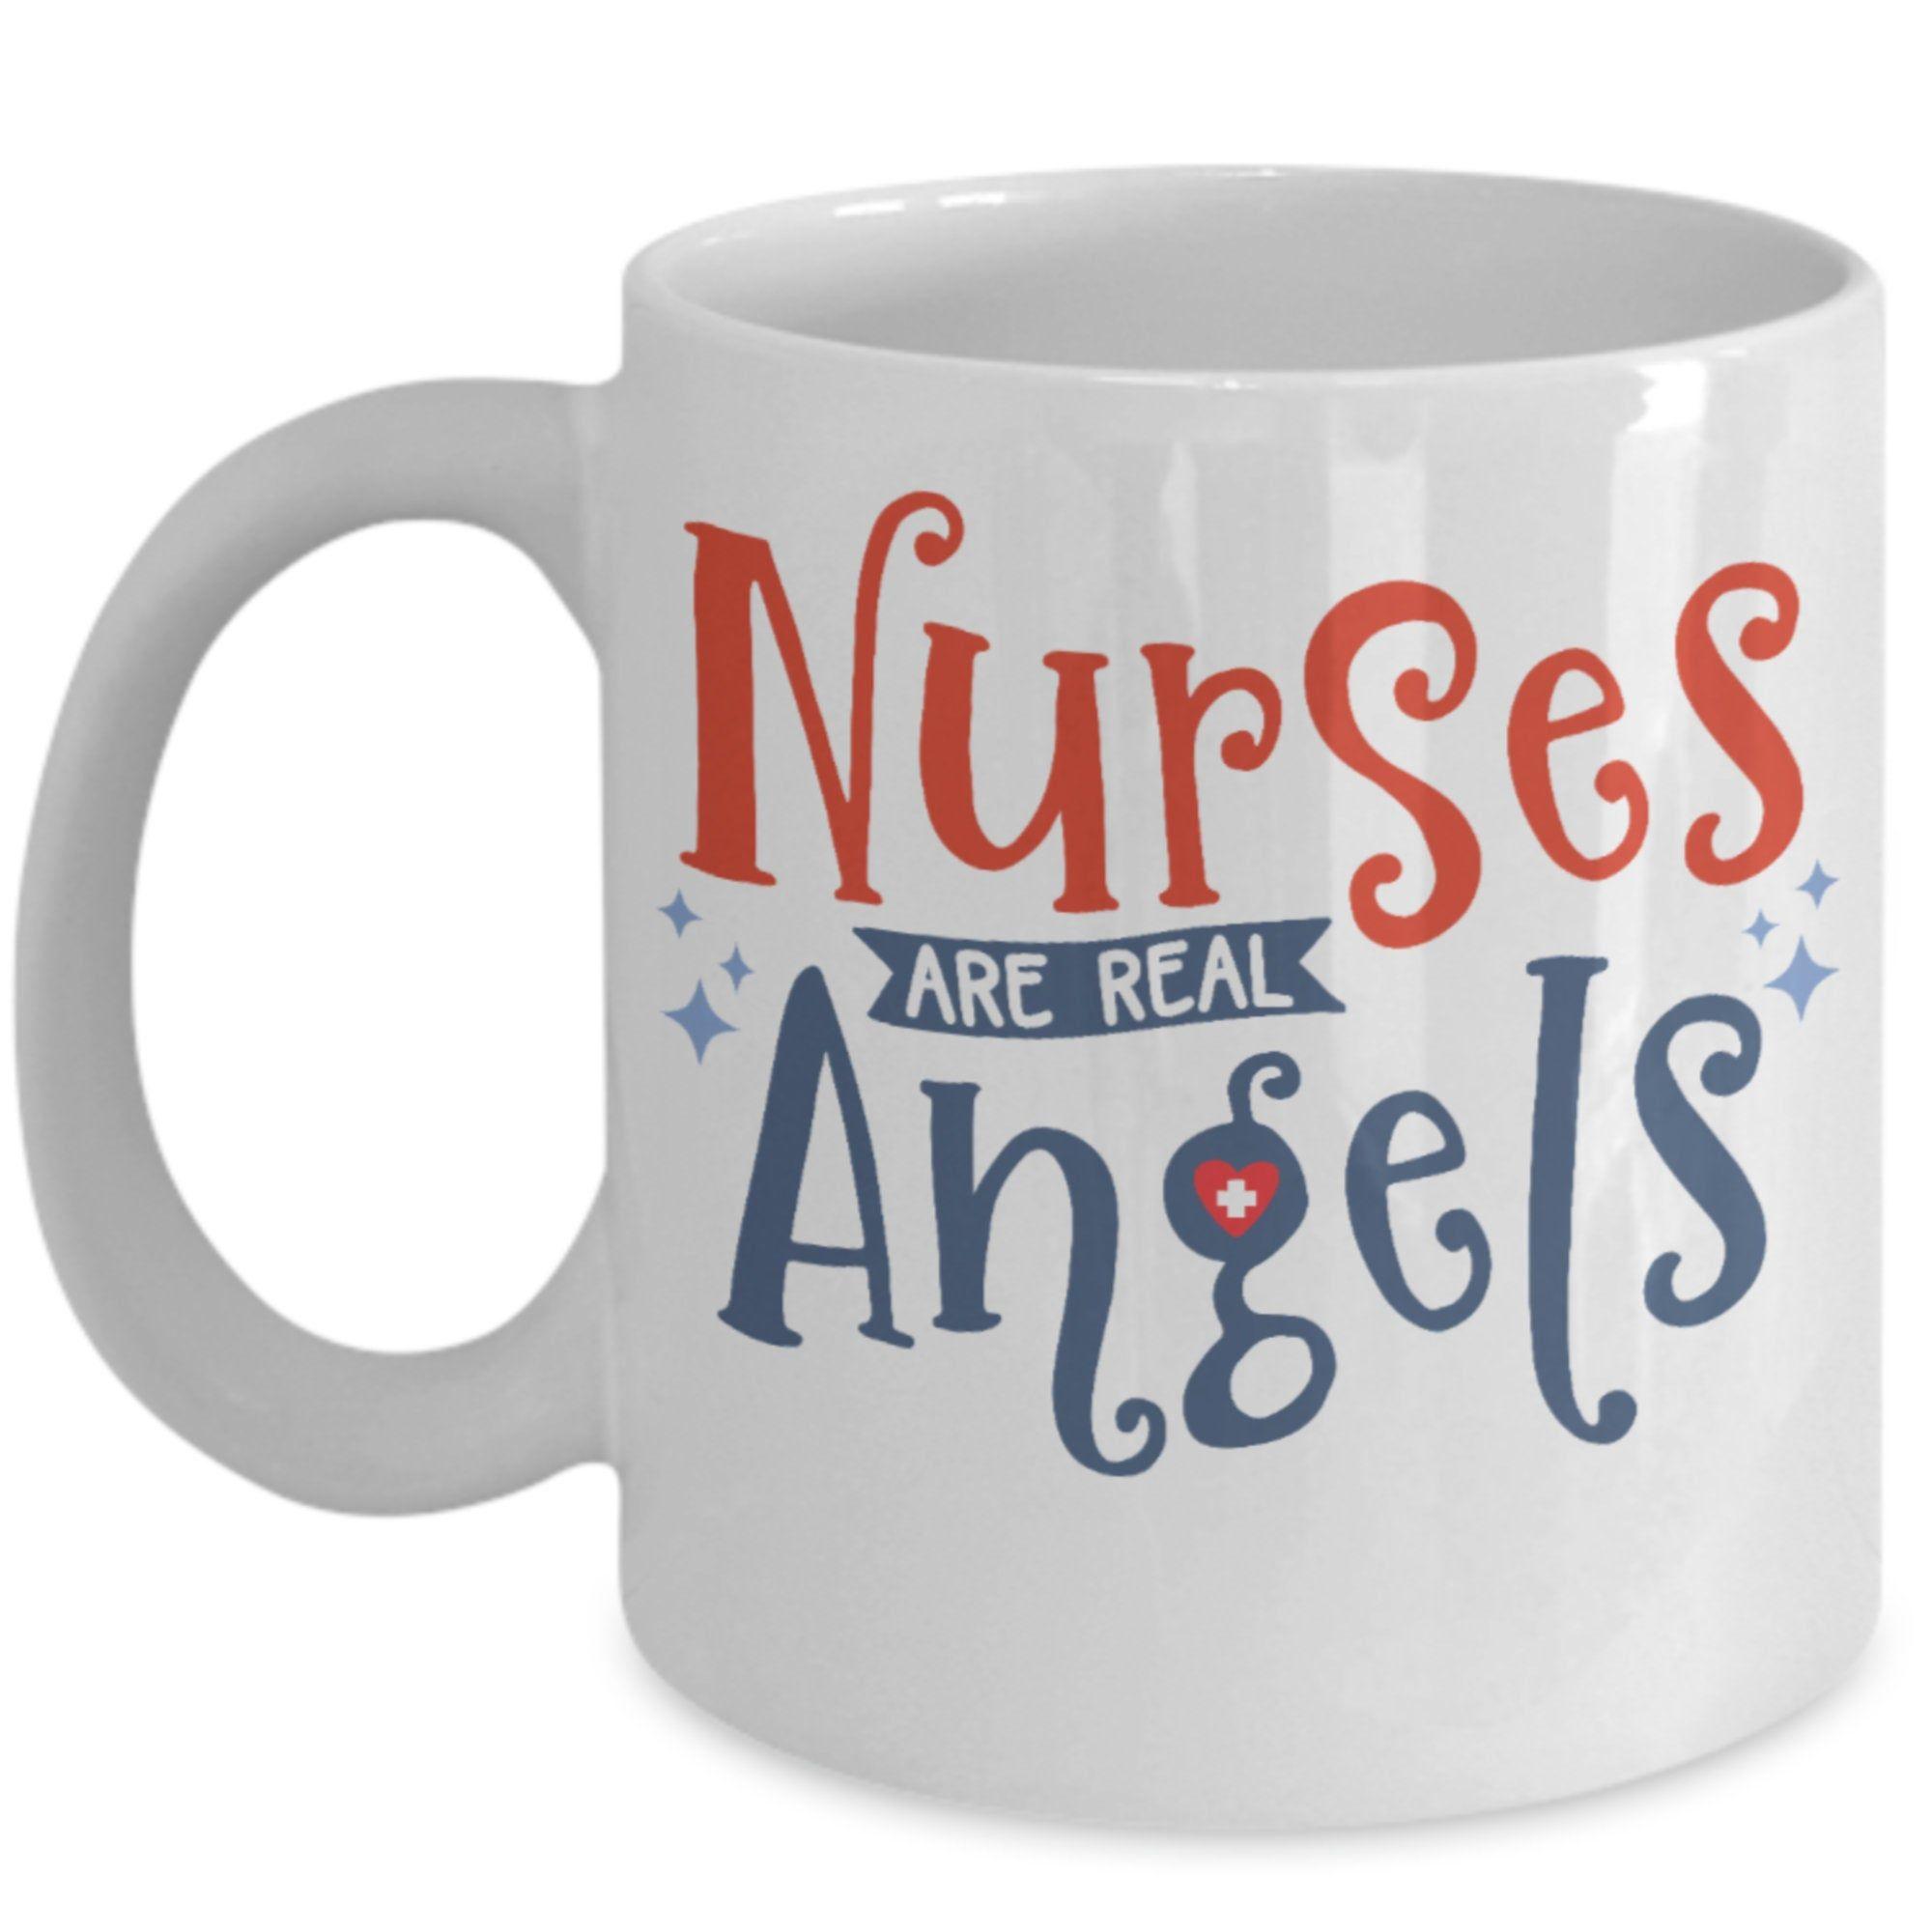 Gifts for nurses mugs for nurses nurse gifts nurse mug